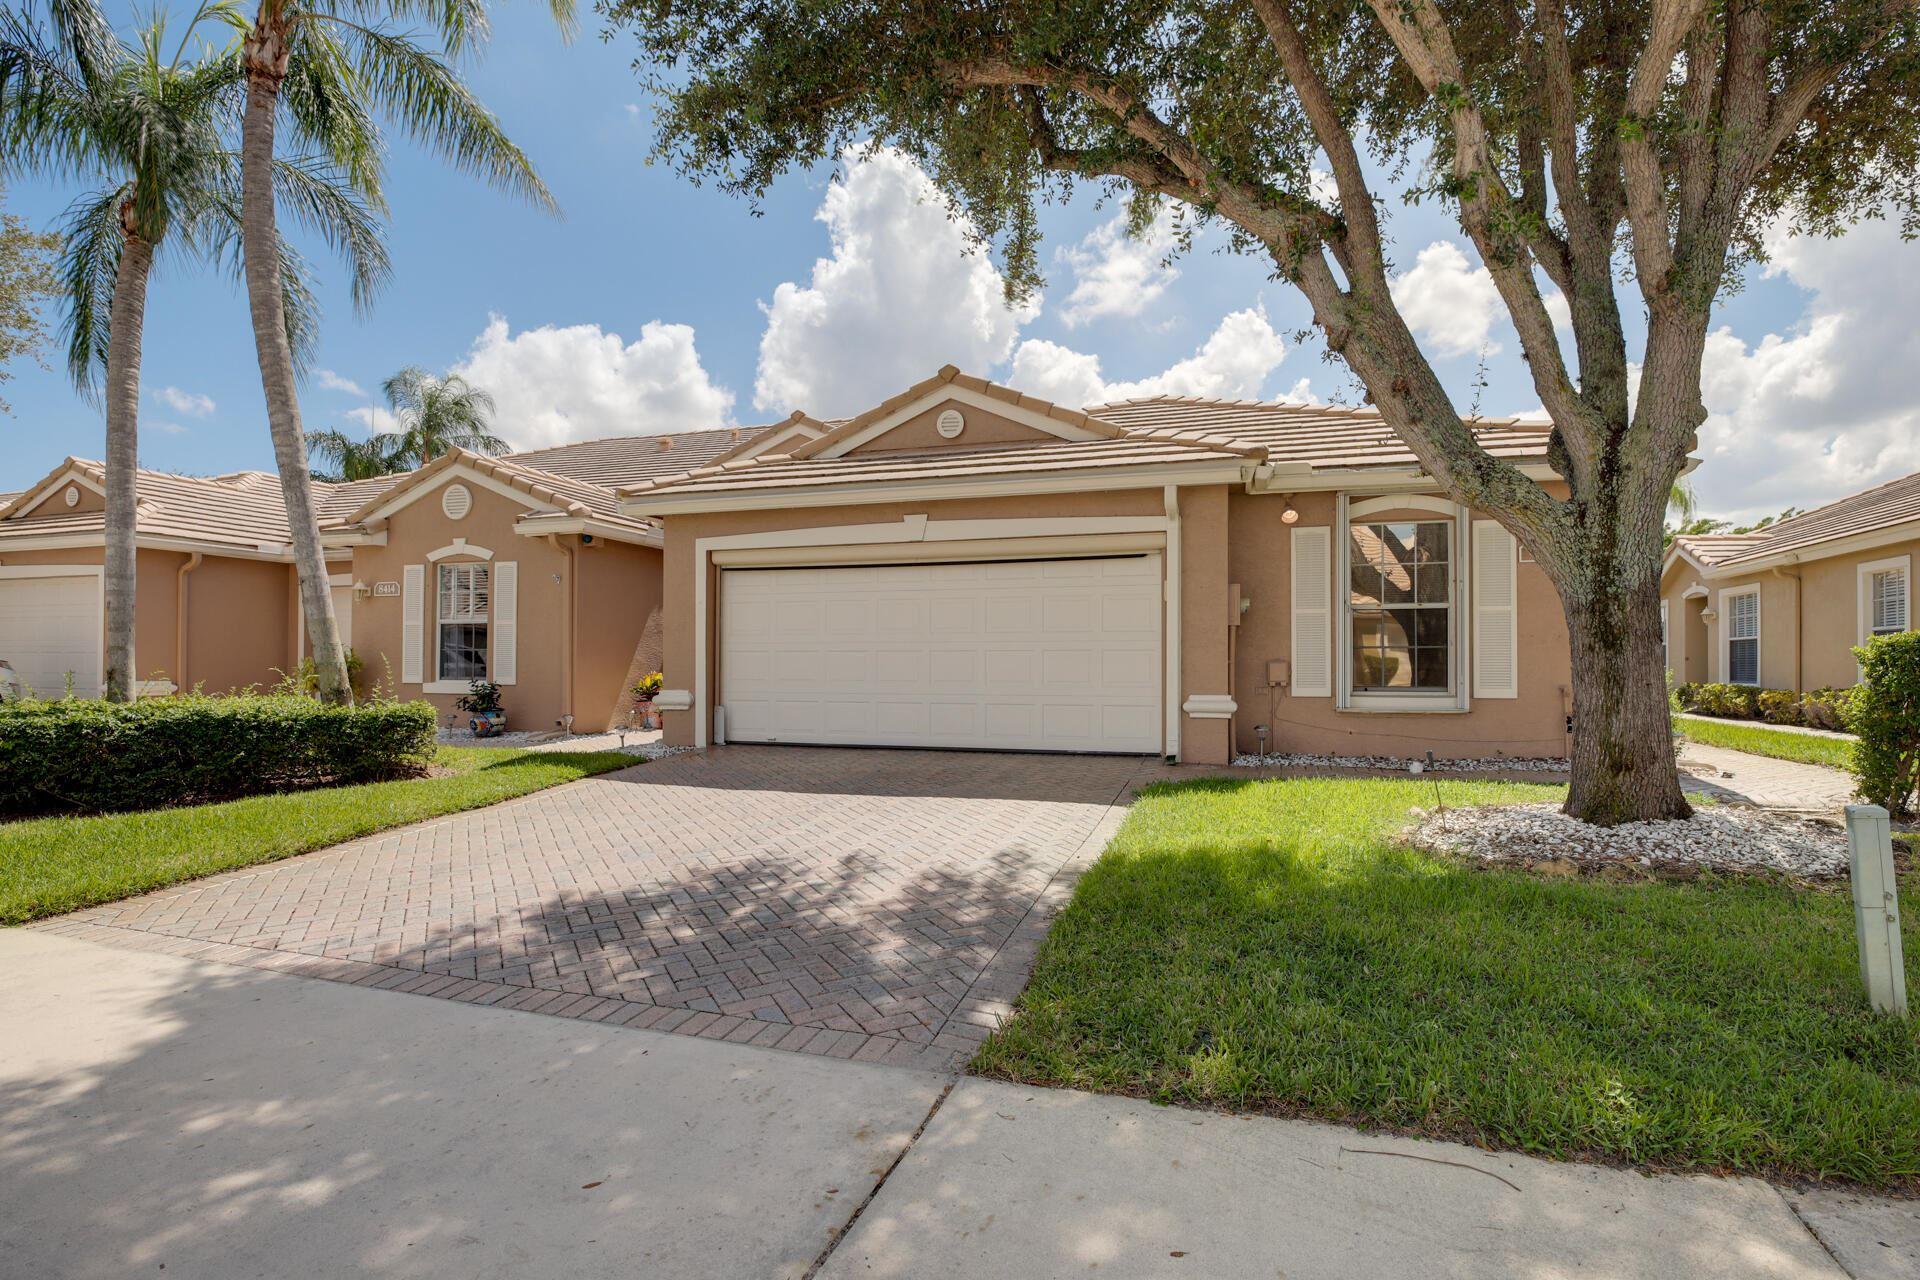 8416 Cargill Point, West Palm Beach, FL 33411 - MLS#: RX-10748968